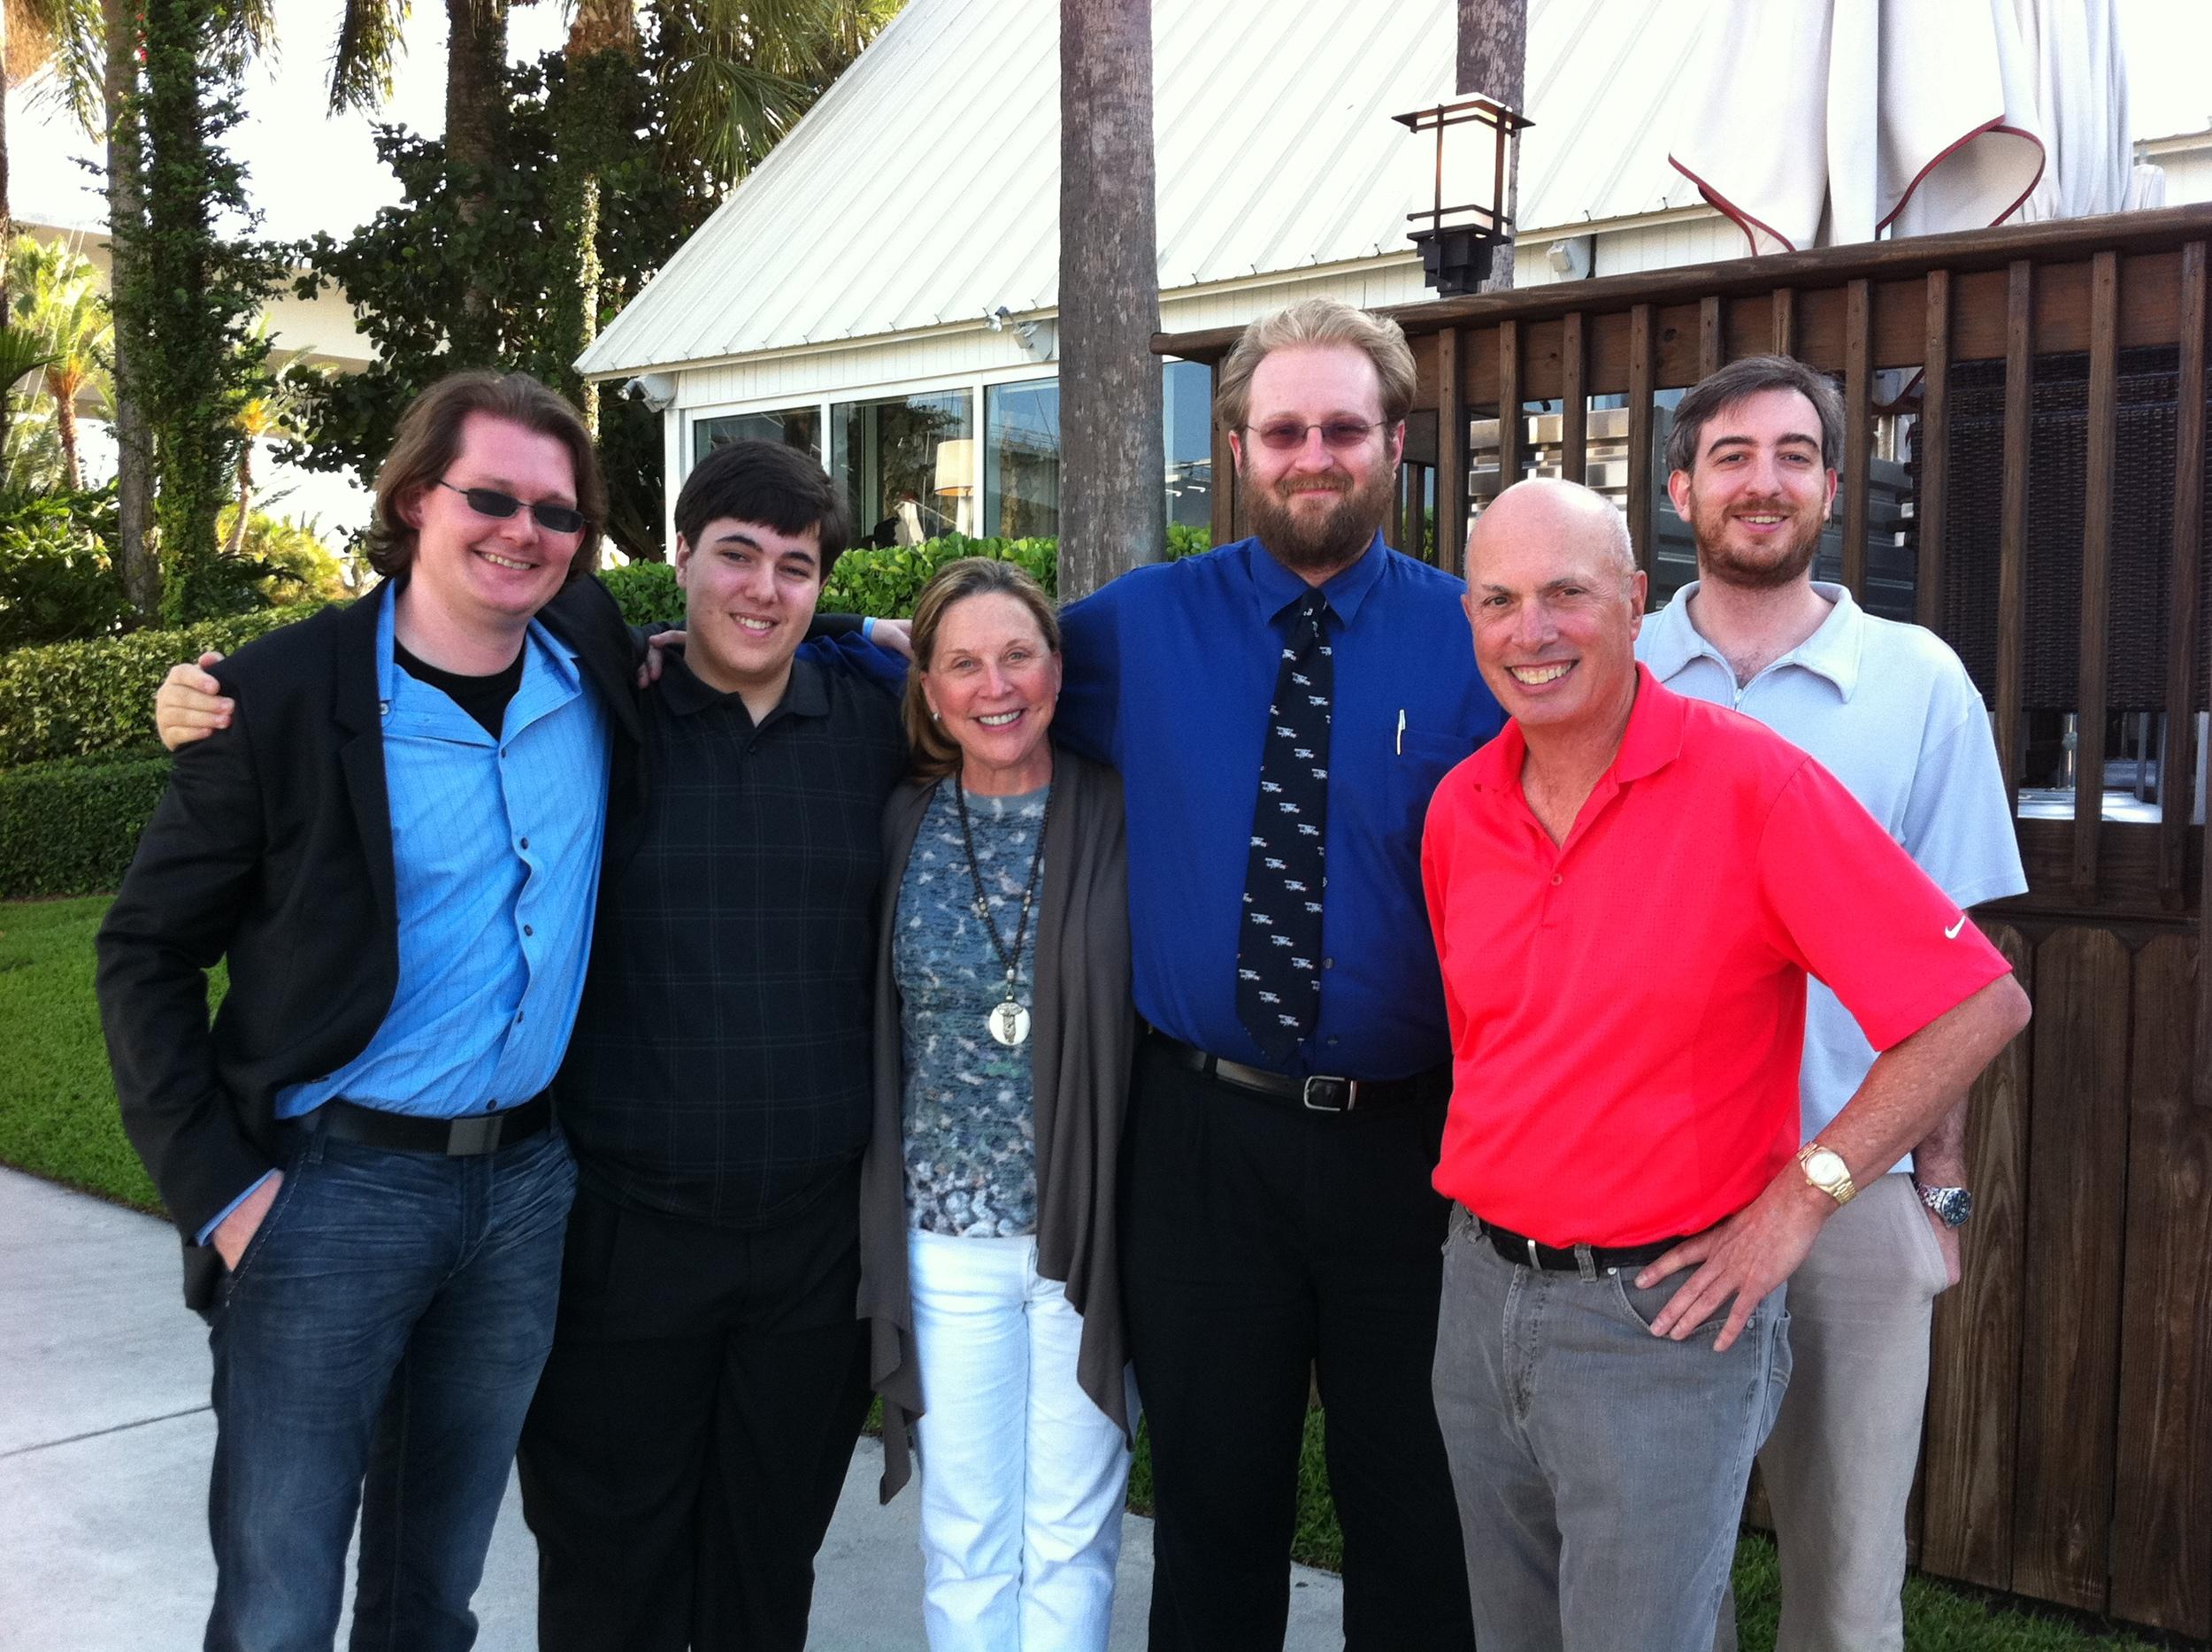 Robert, Adam K, Judy, McKenzie, Dale, Adam P in Ft Lauderdale Apr 11.jpg